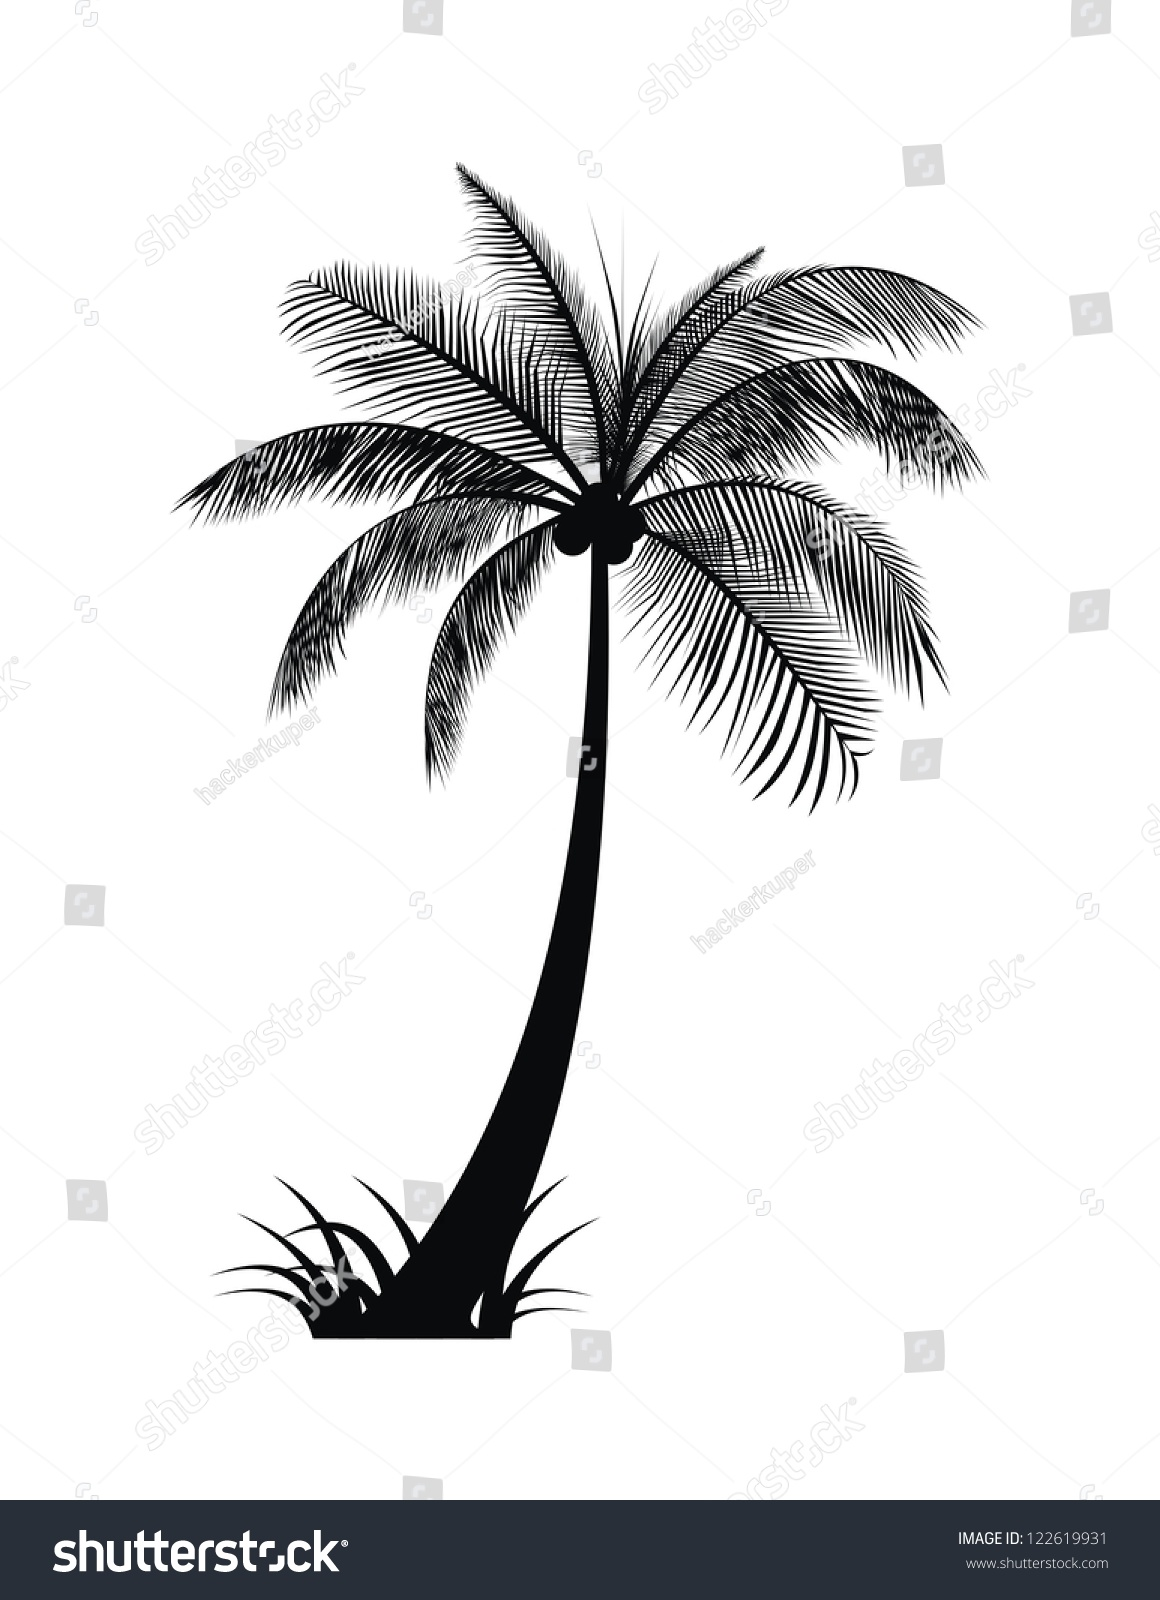 silhouette date palm tree - photo #28